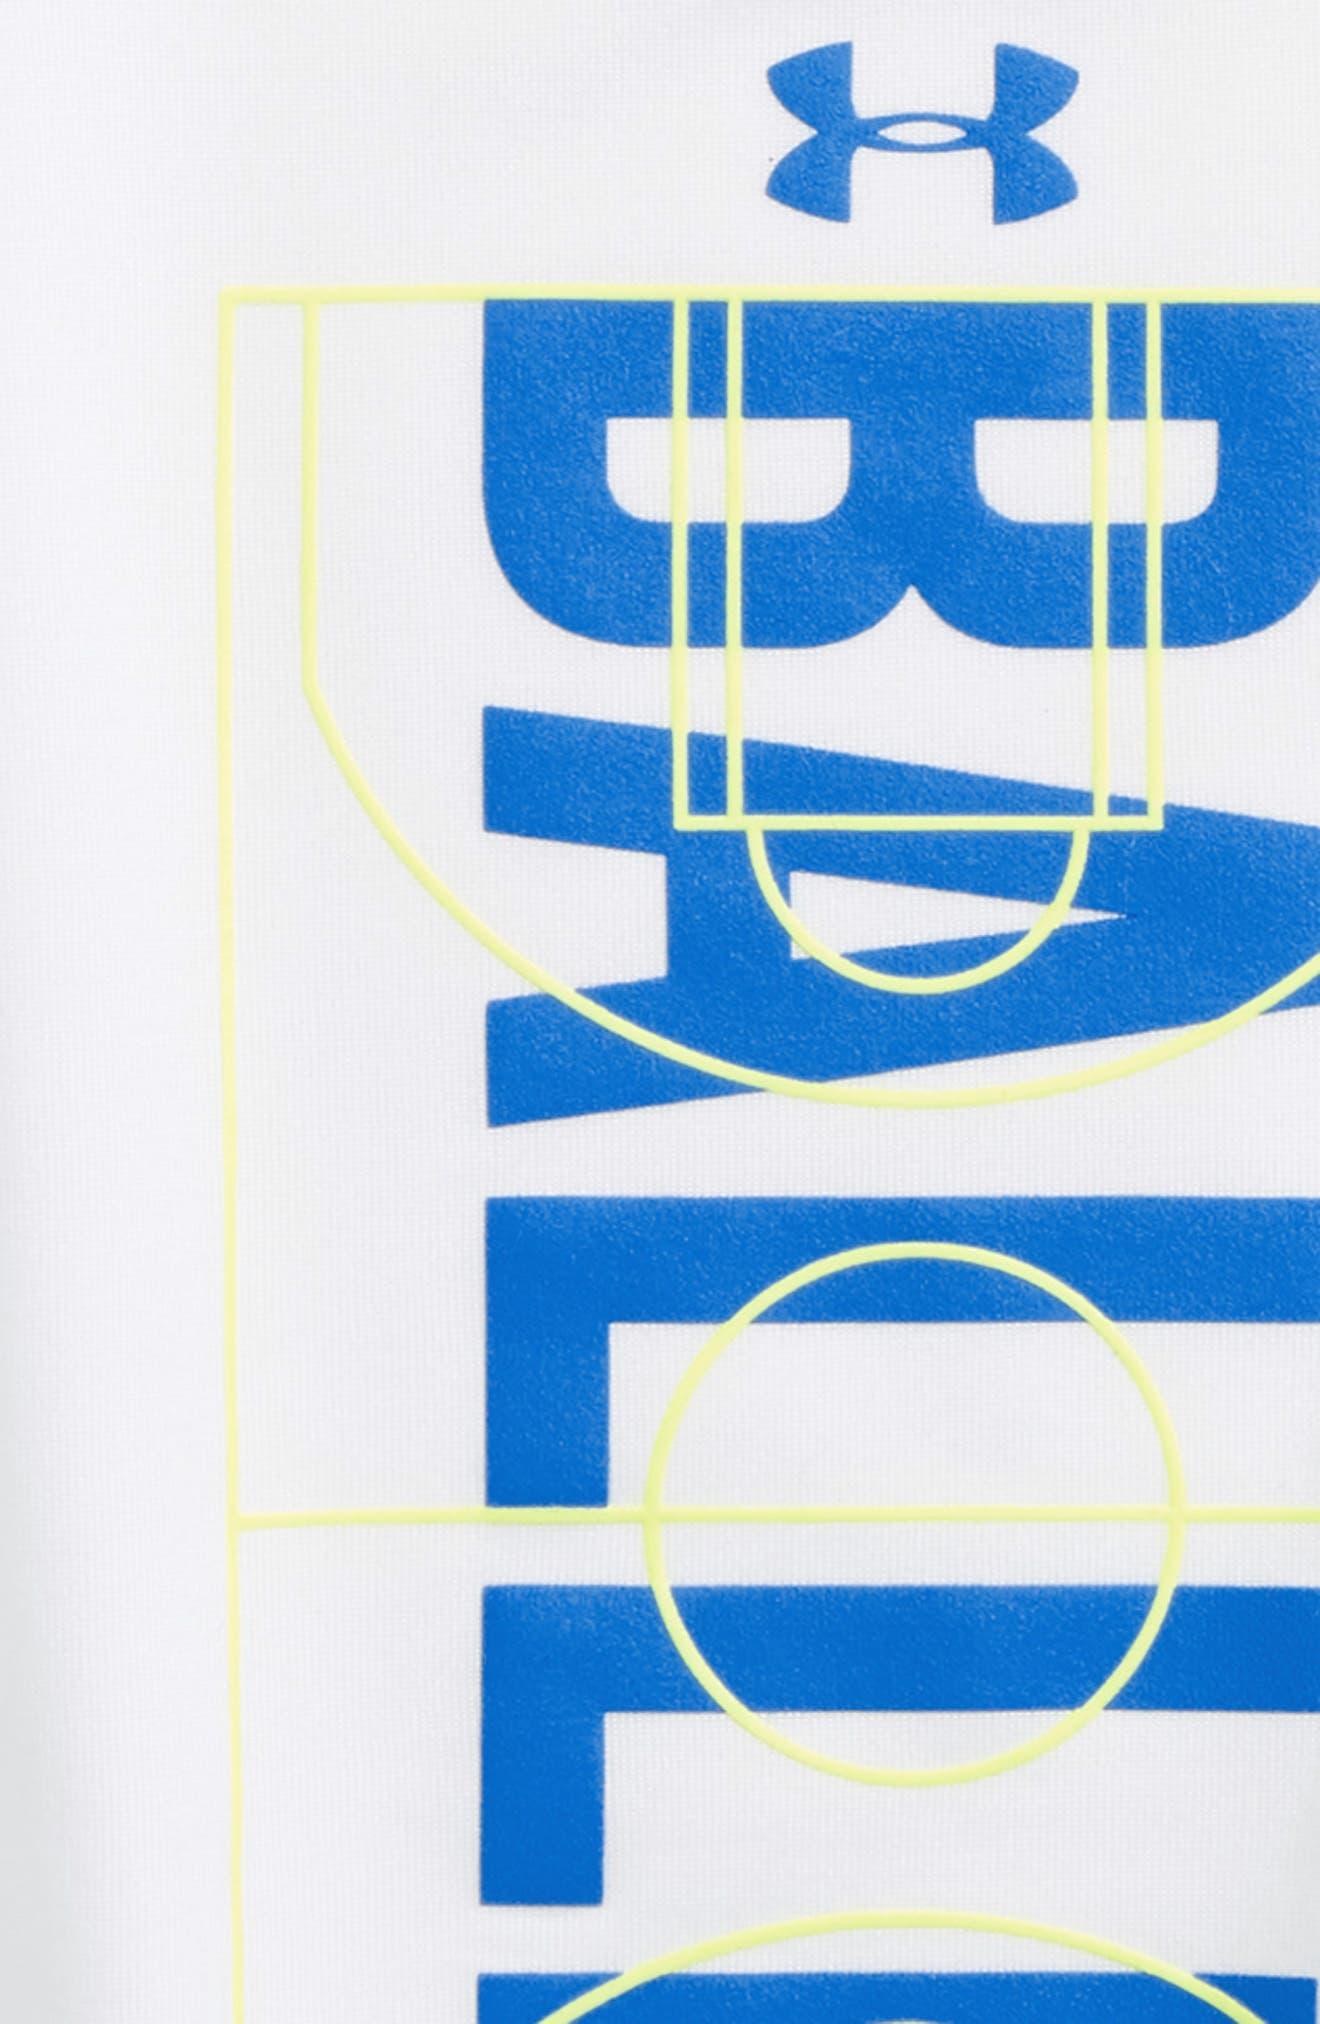 Baller HeatGear<sup>®</sup> Glow-in-the-Dark T-Shirt,                             Alternate thumbnail 2, color,                             100